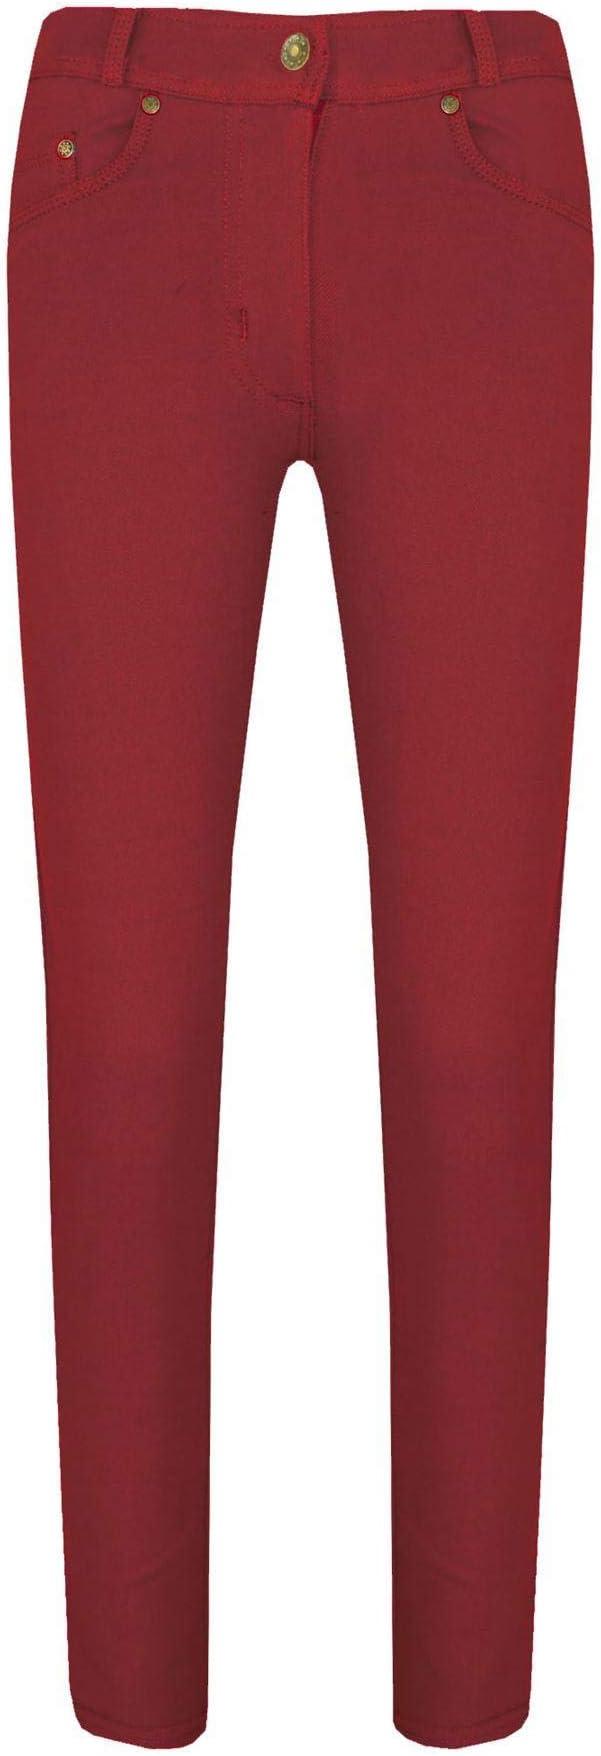 A2Z 4 Kids/® Girls Skinny Jeans Kids Lemon Stretchy Denim Jeggings Fit Pants Trousers 5-13 Yr